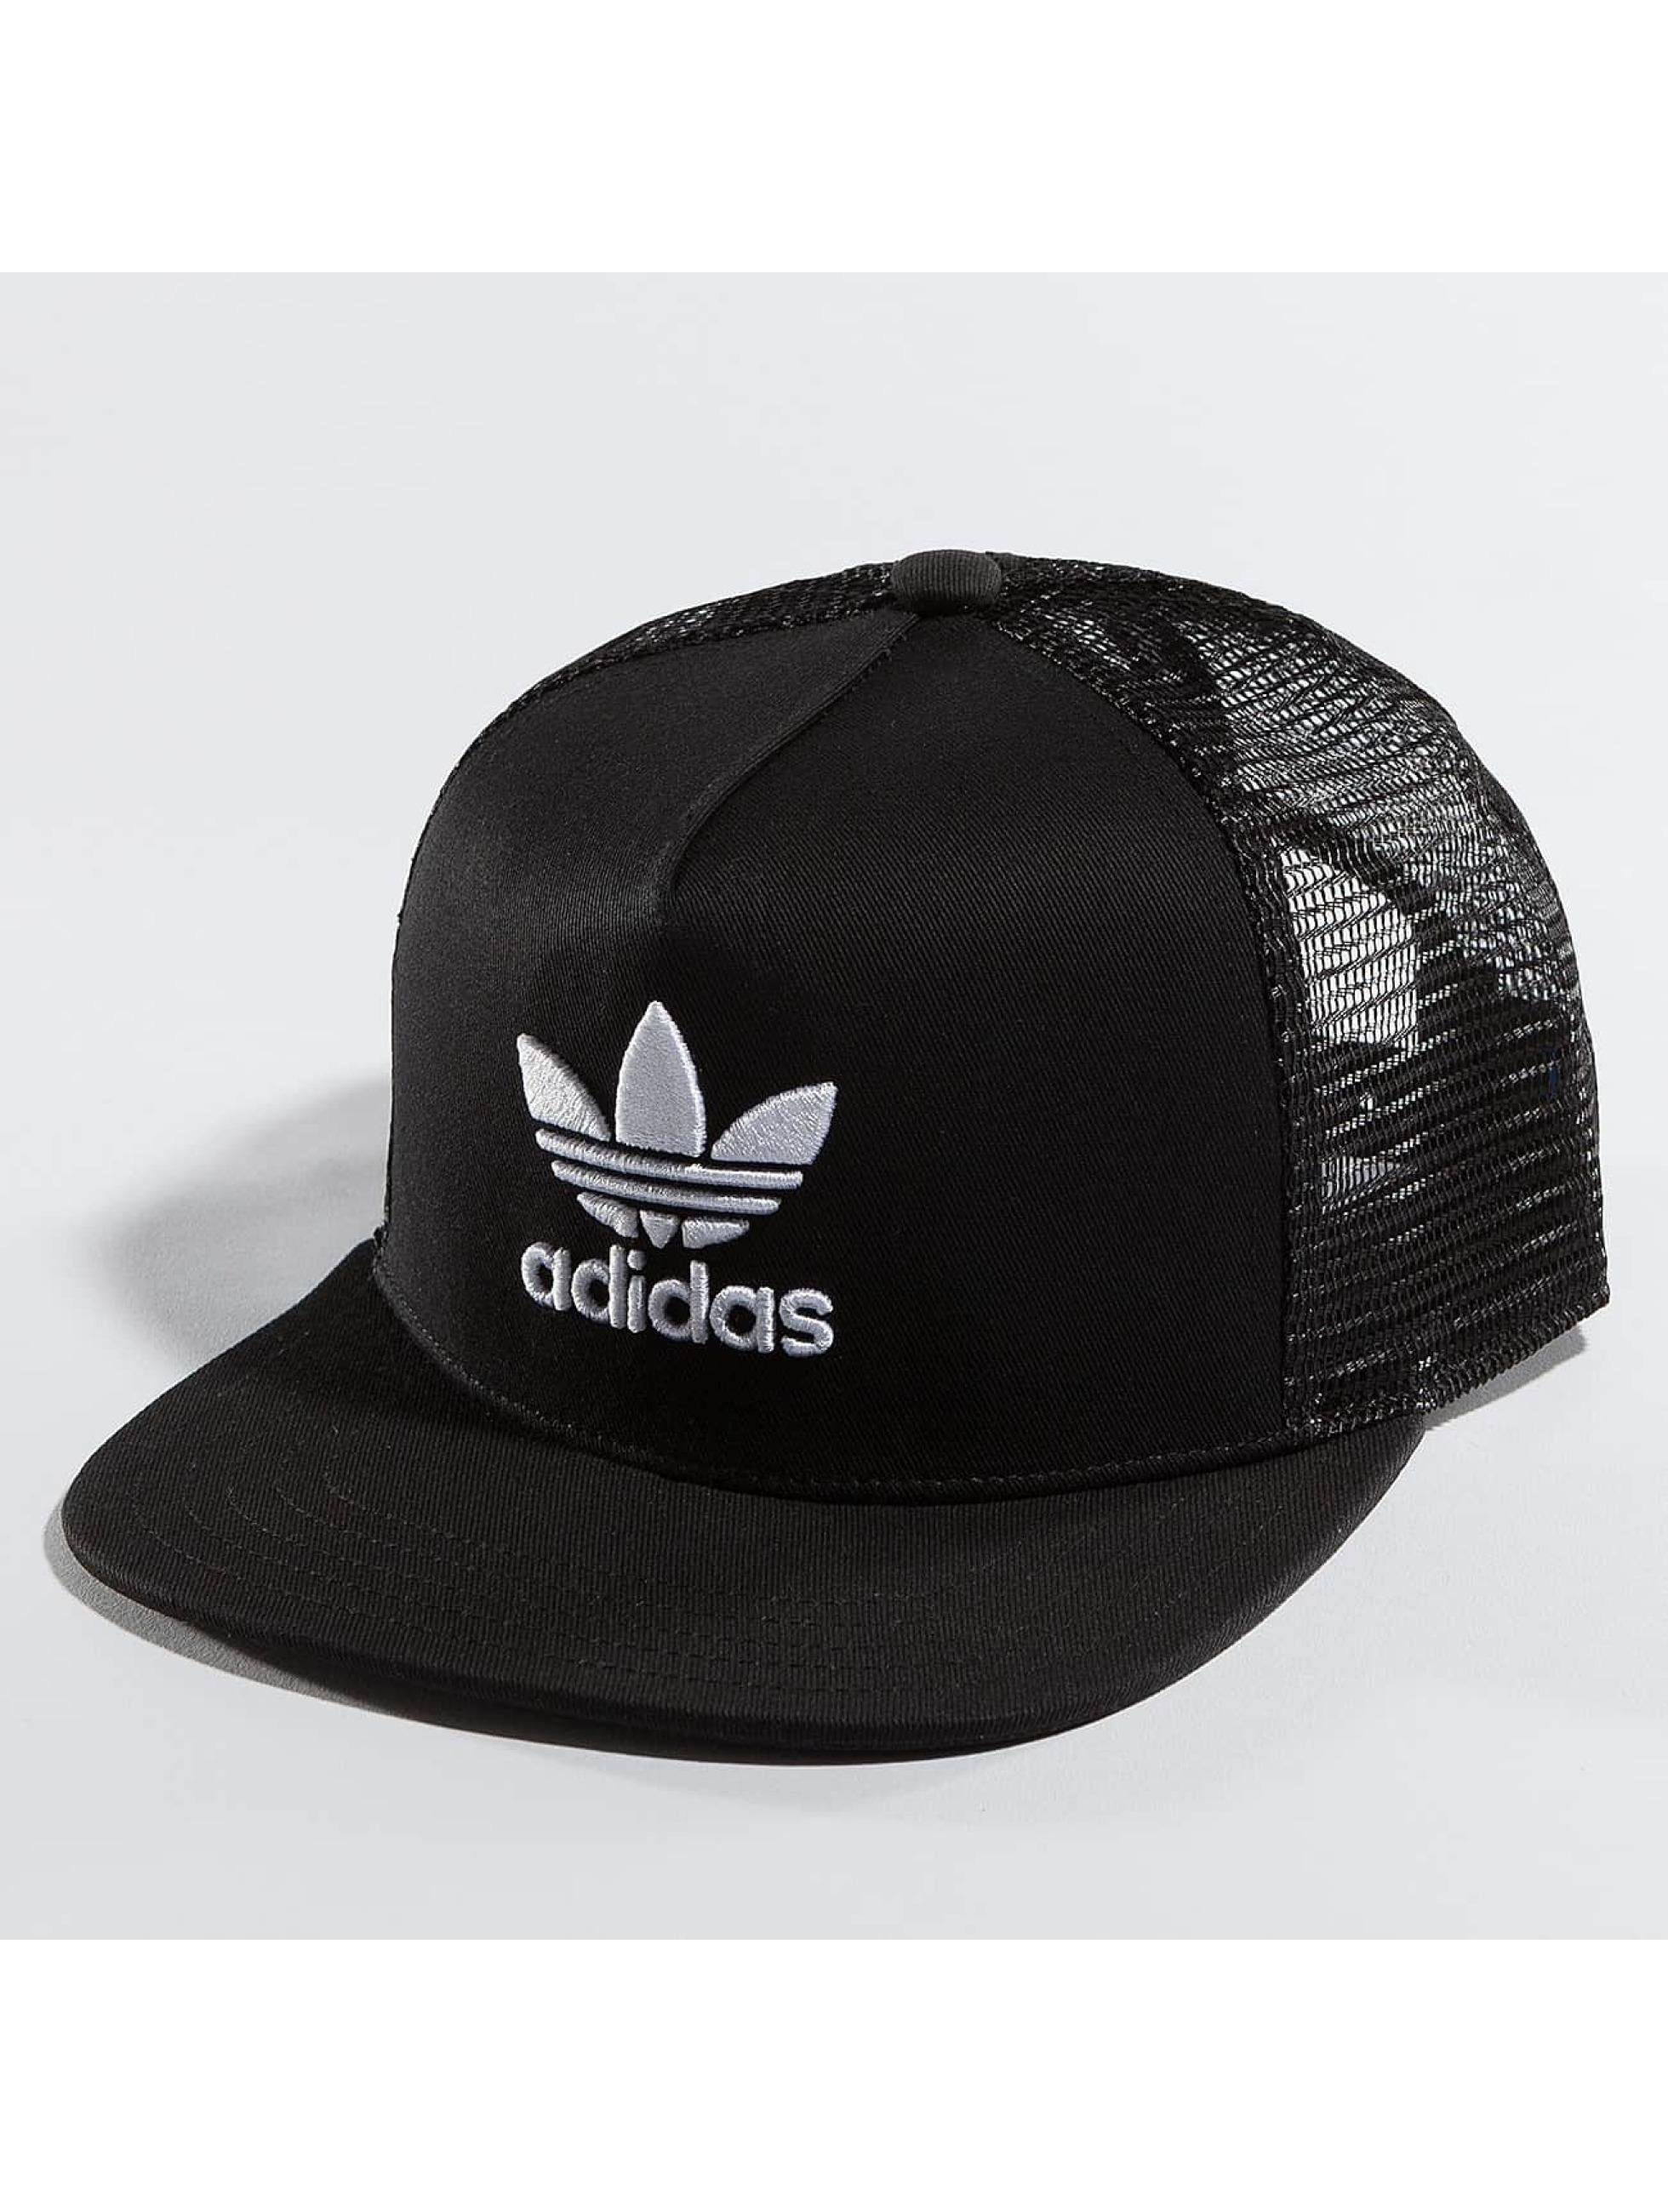 adidas herren caps trucker cap trefoil ebay. Black Bedroom Furniture Sets. Home Design Ideas